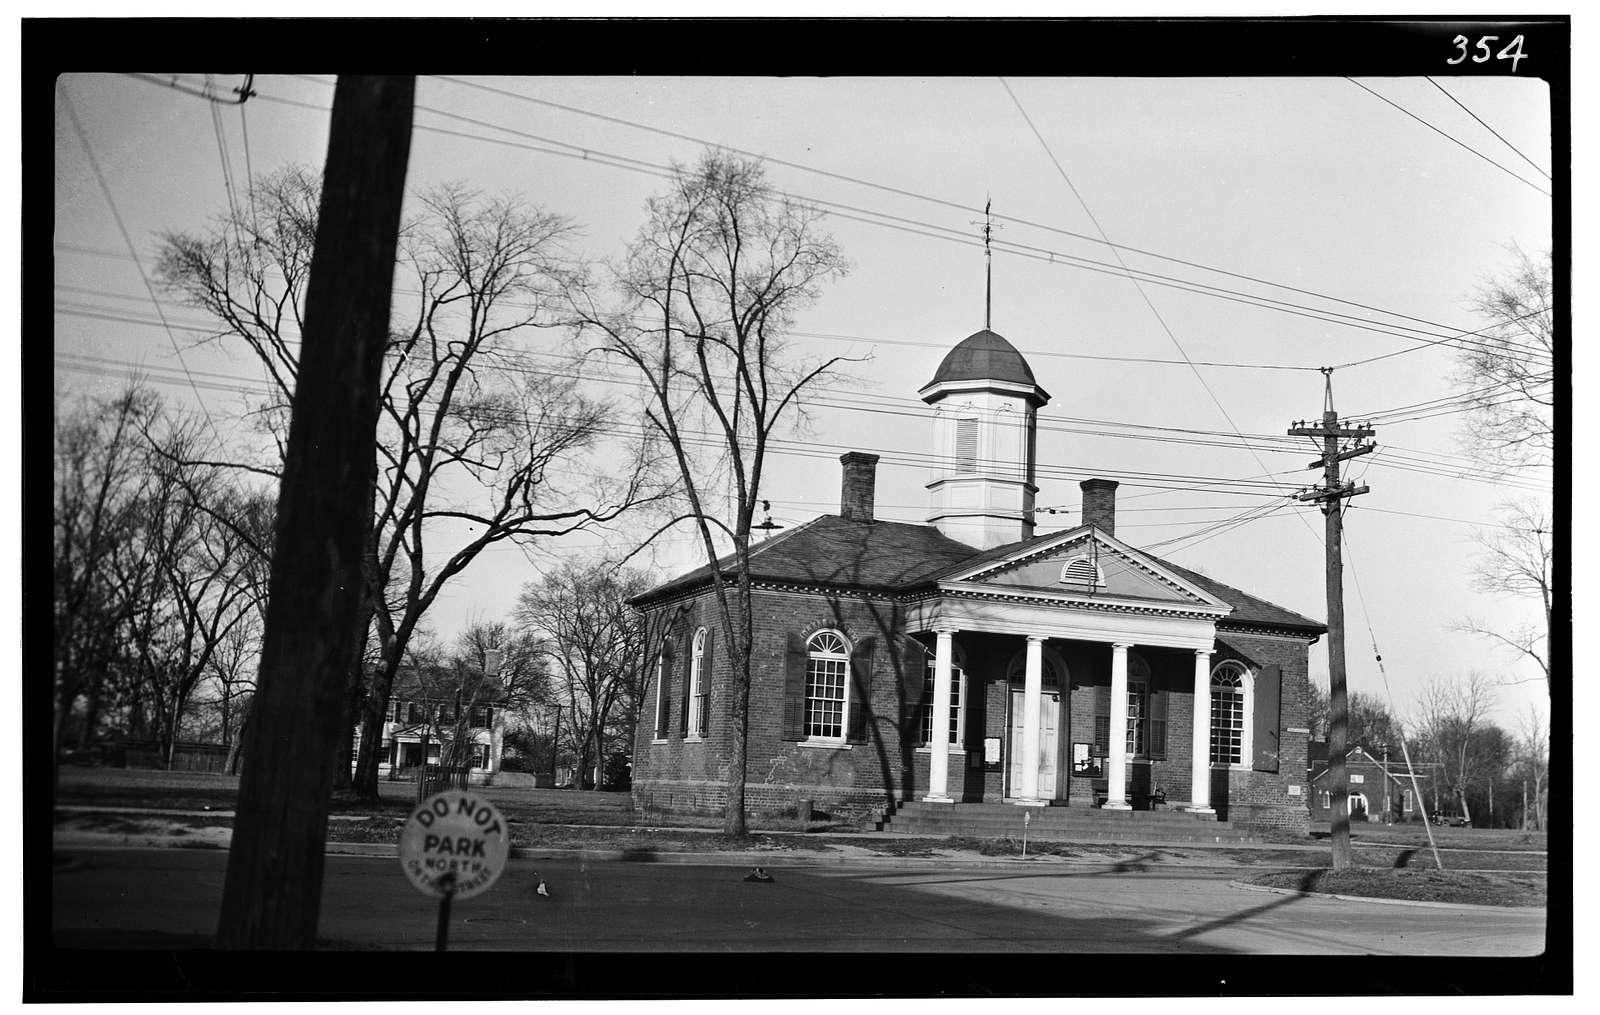 Old Courthouse, Courthouse Green, Williamsburg, Williamsburg, VA